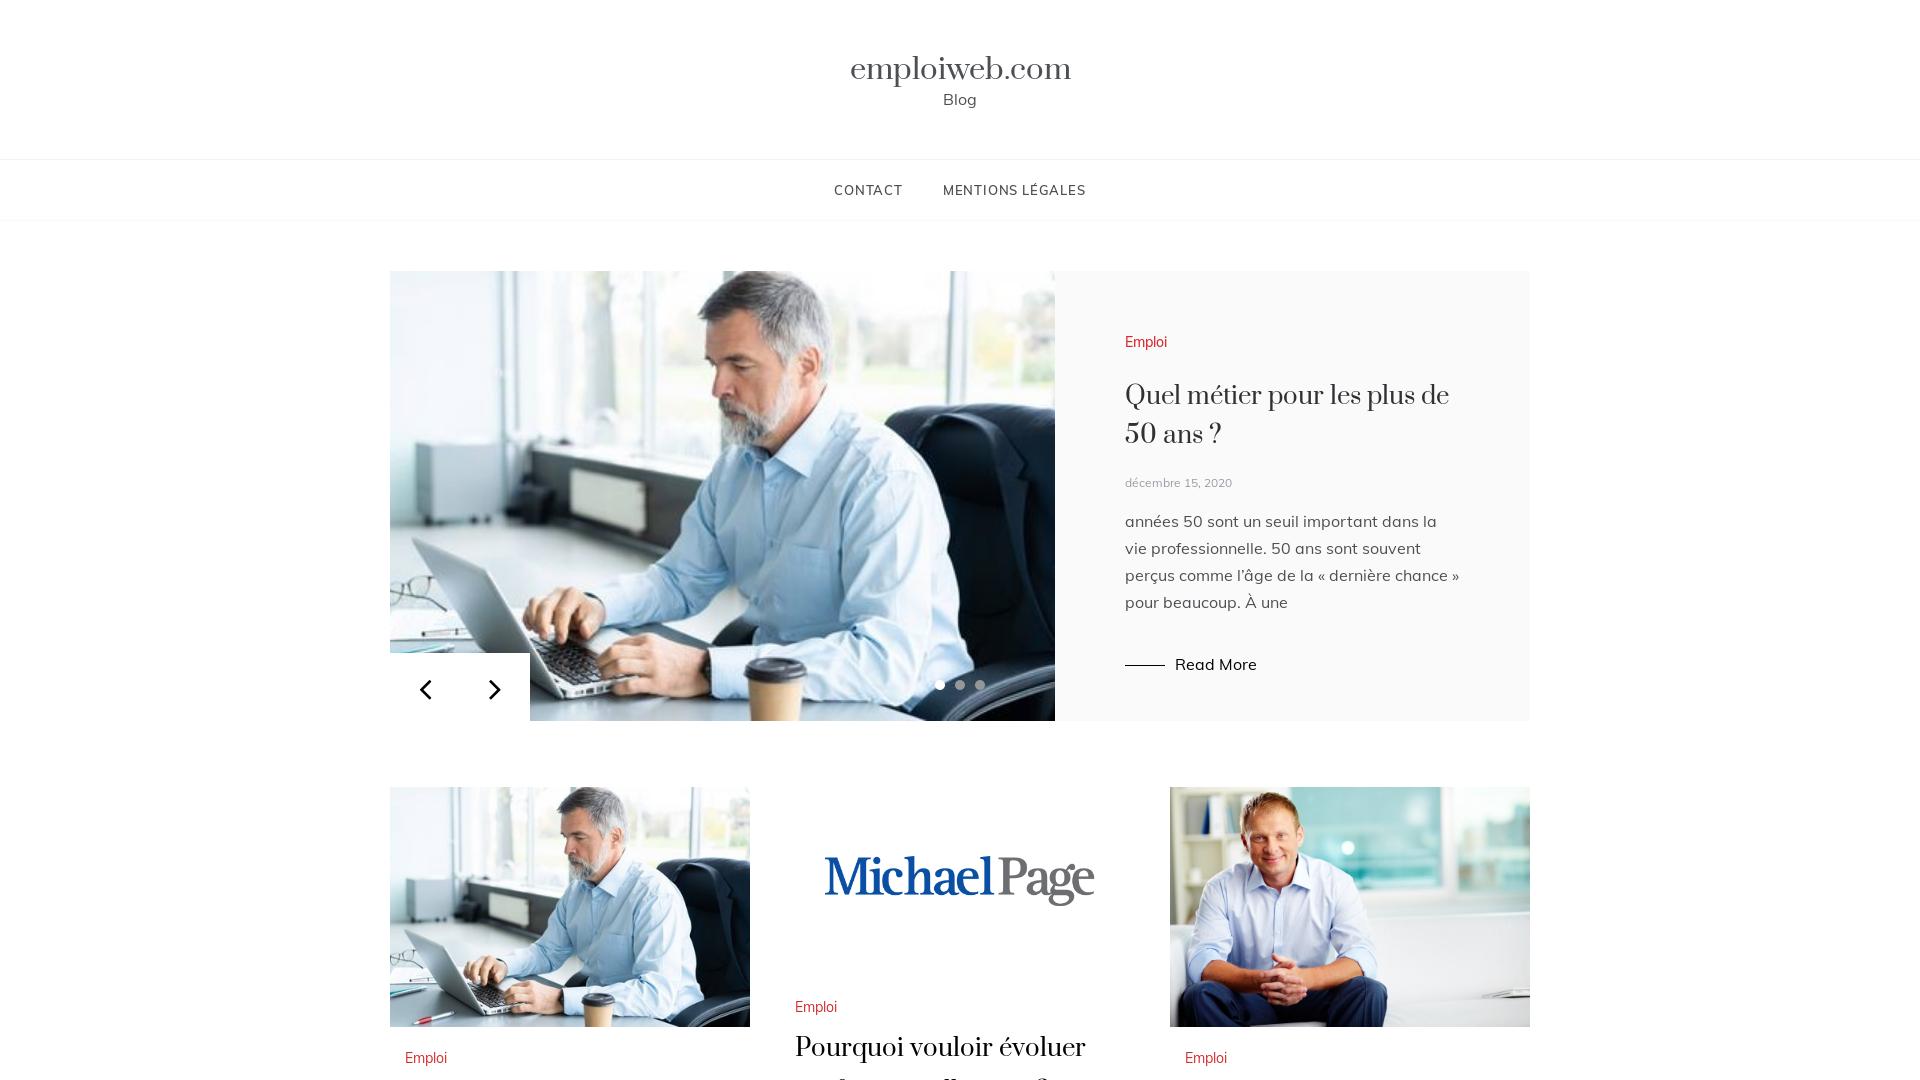 emploiweb.com